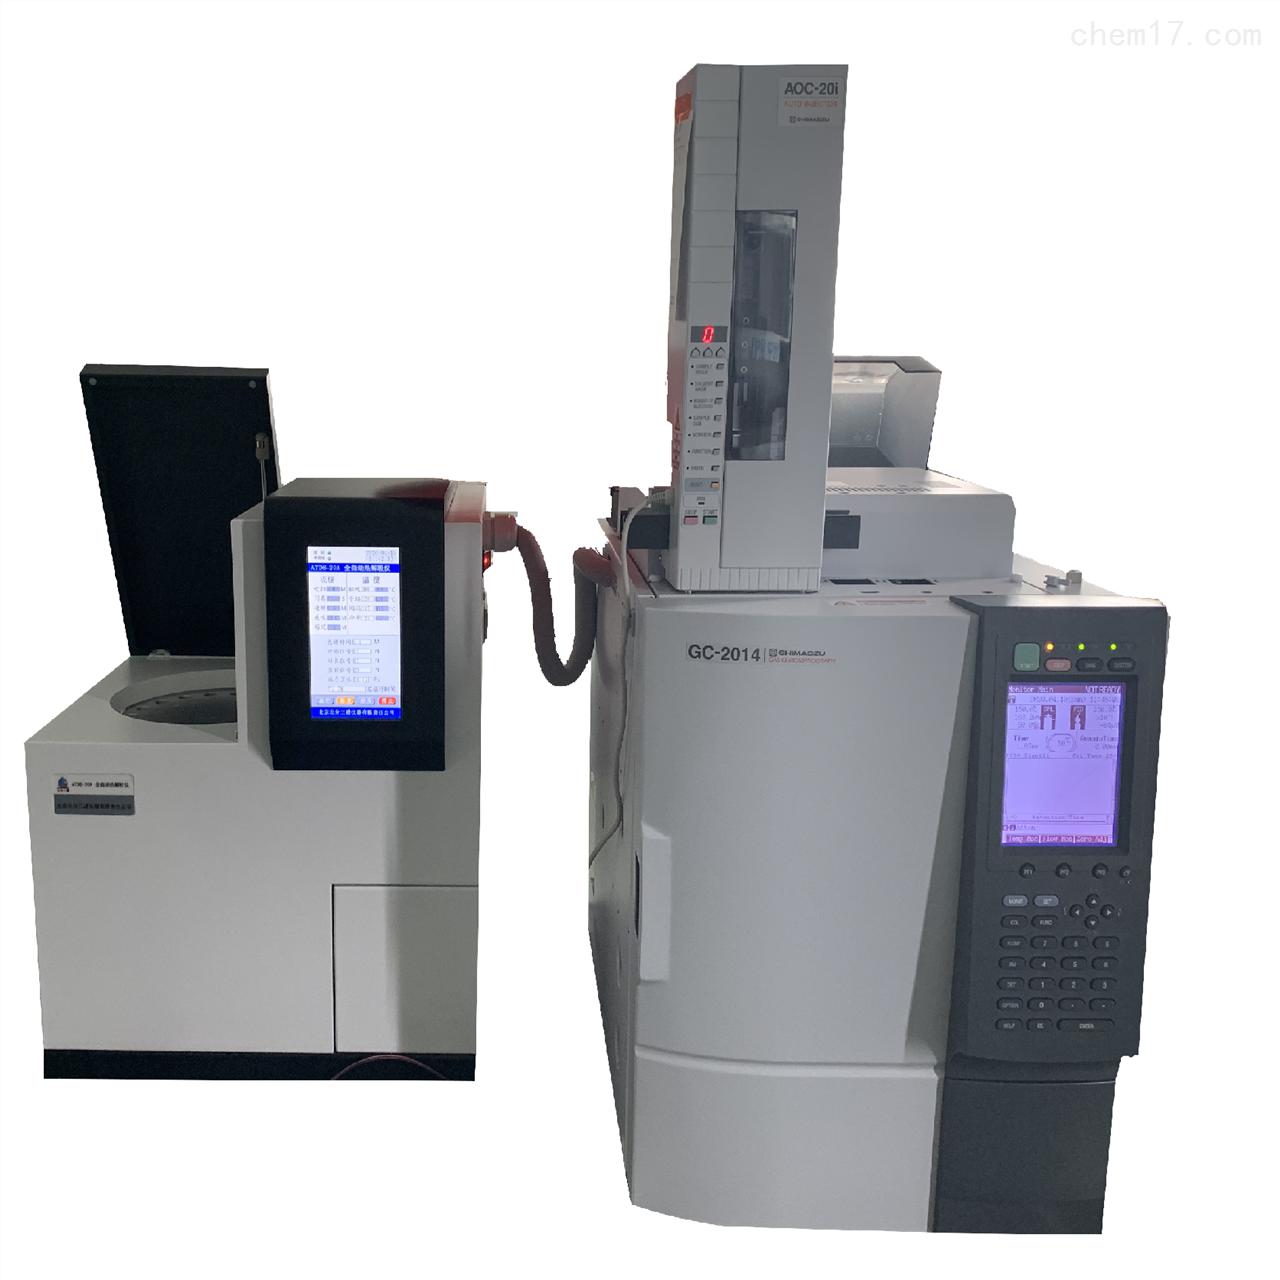 GB 503252020民用建筑工程室内环境检测方案